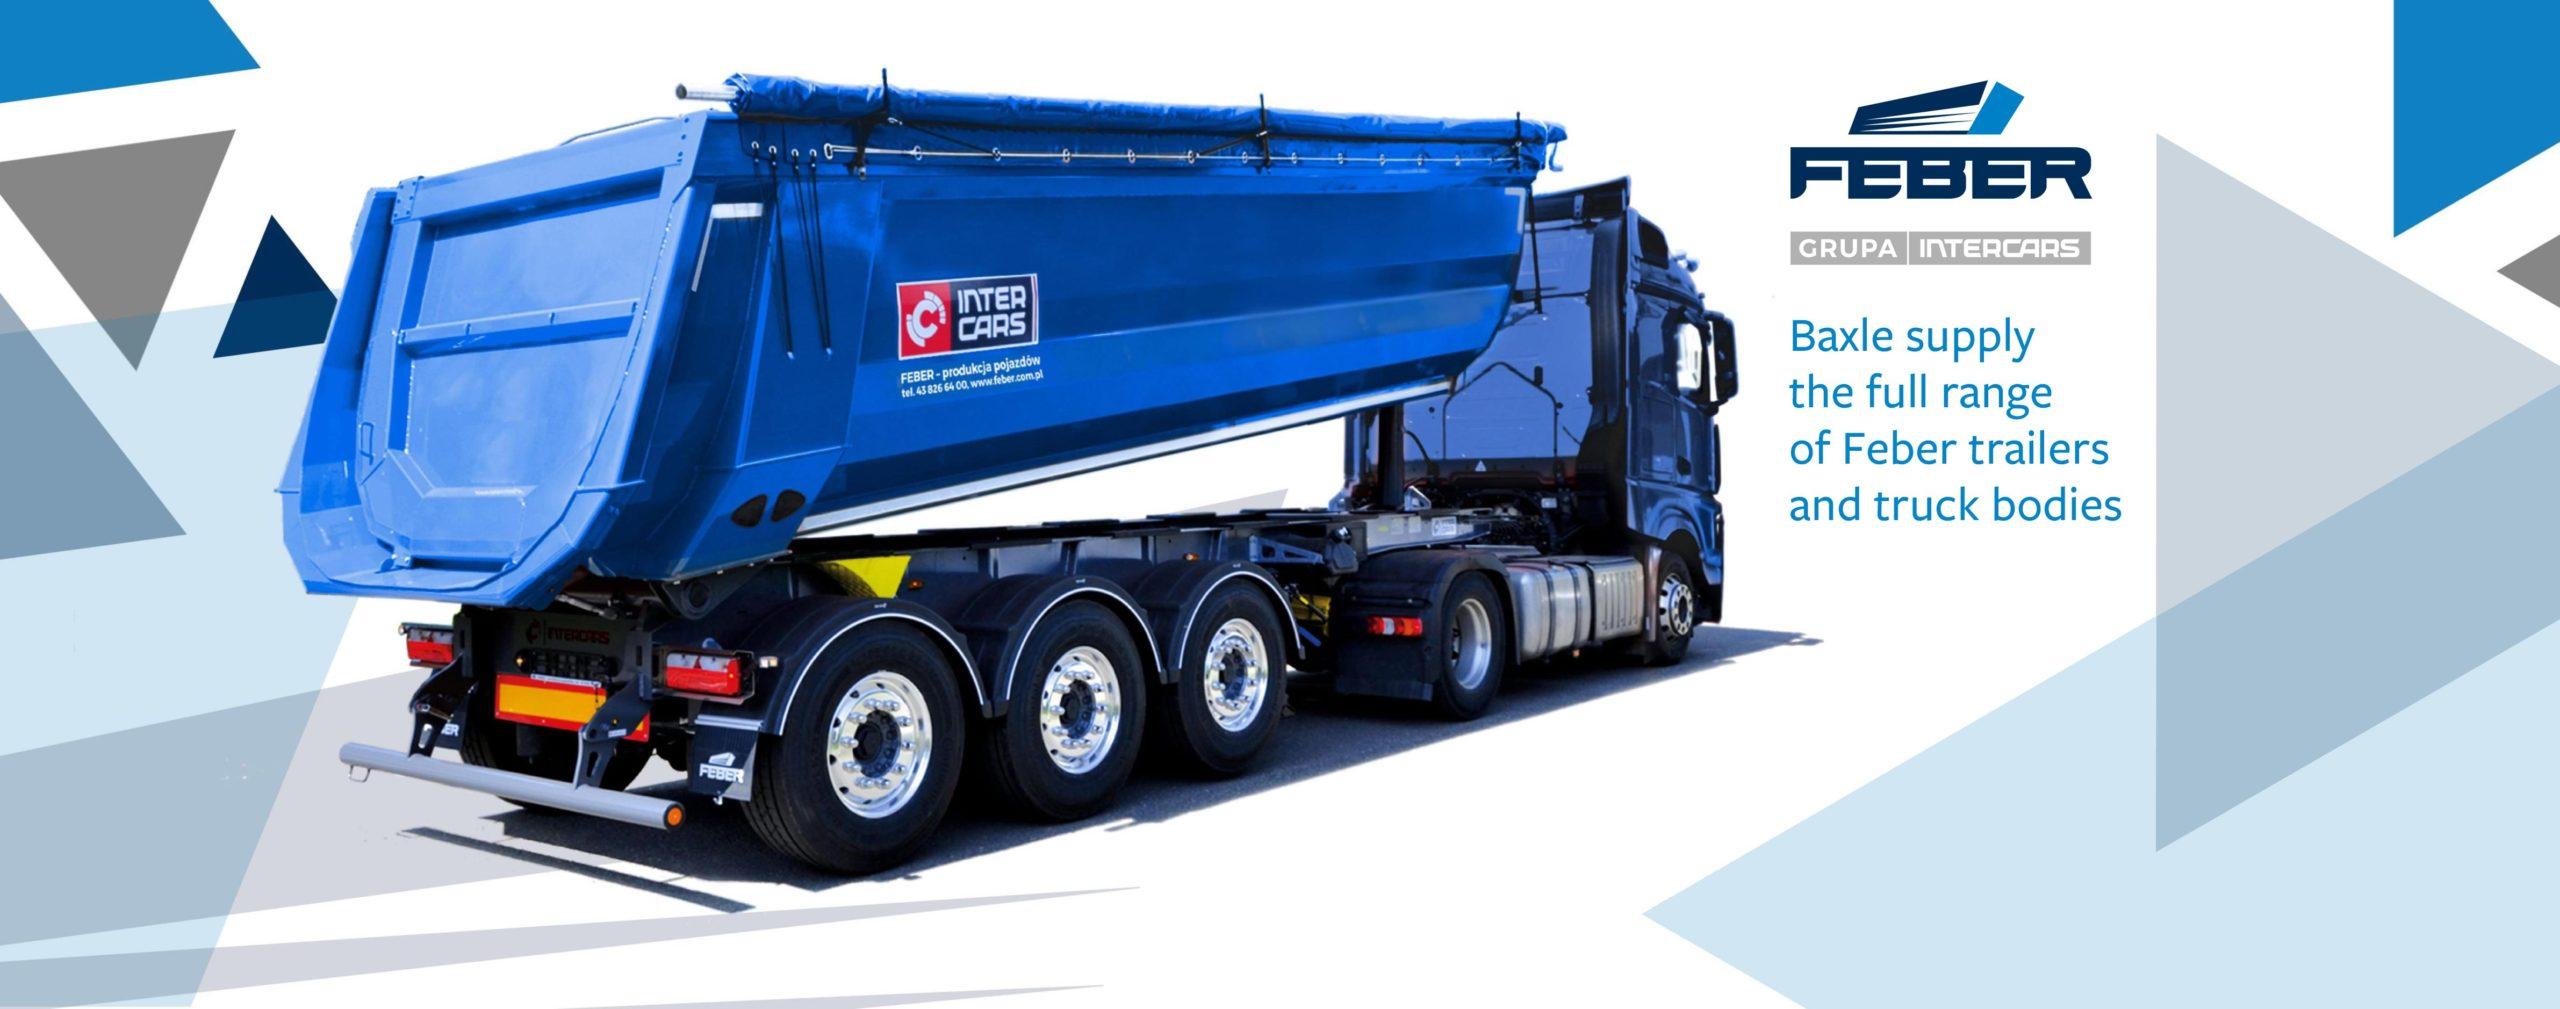 Feber semi-trailers for aggregate transportation at Baxle